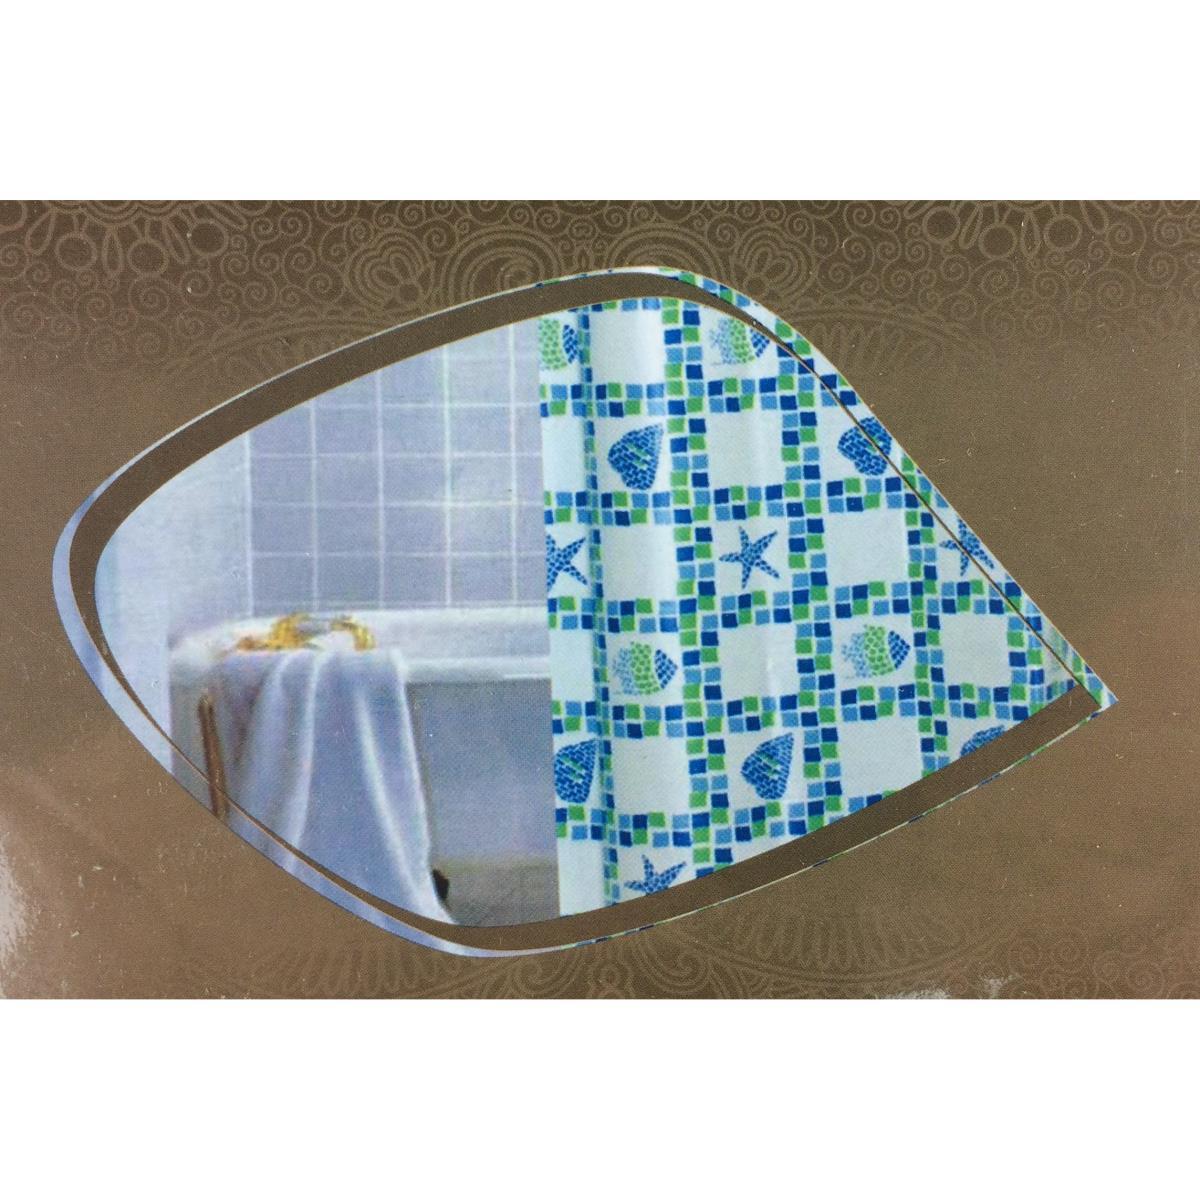 Duschabtrennung  Duschvorhang Badvorhang  Wannenvorhang mit Ringe 180 x 180 cm ,UAB,000051182743, 4770364246784